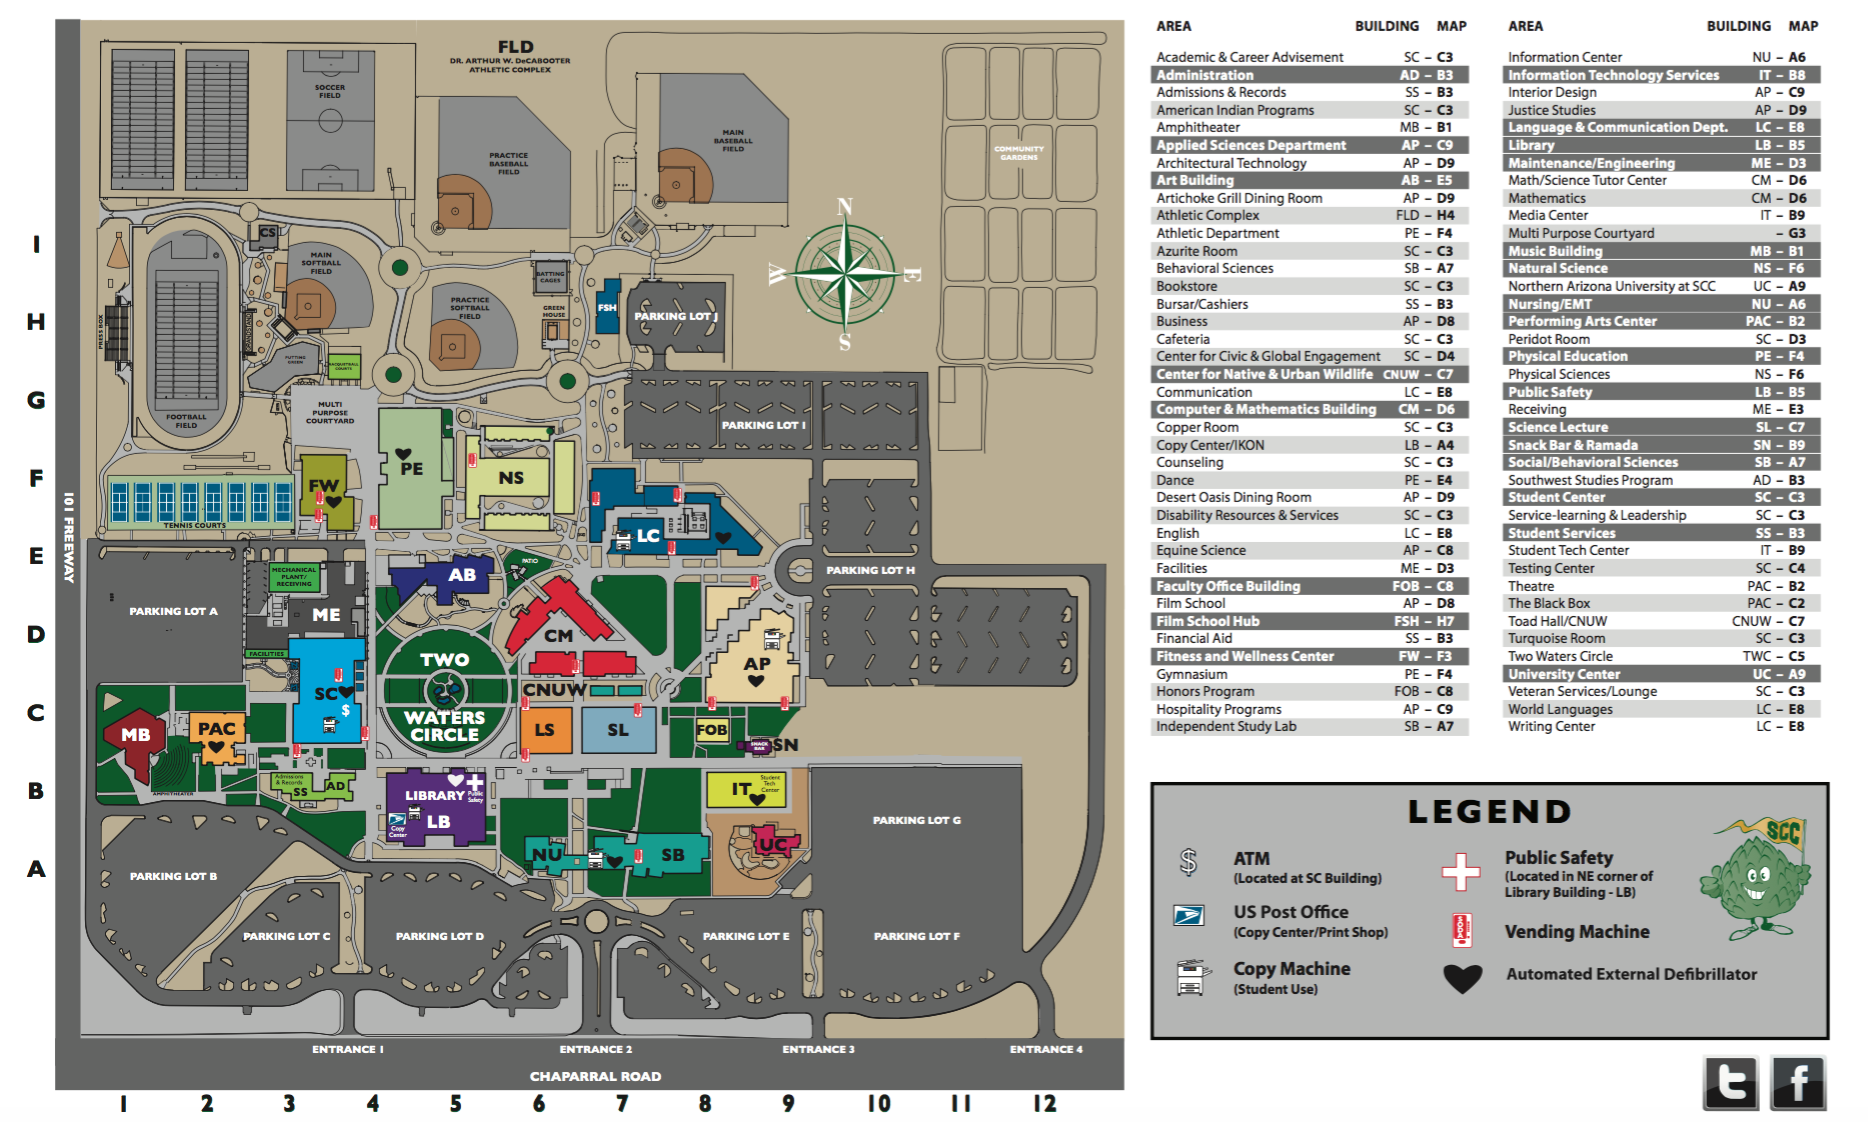 Scc Campus Map Acda 2016 West Region